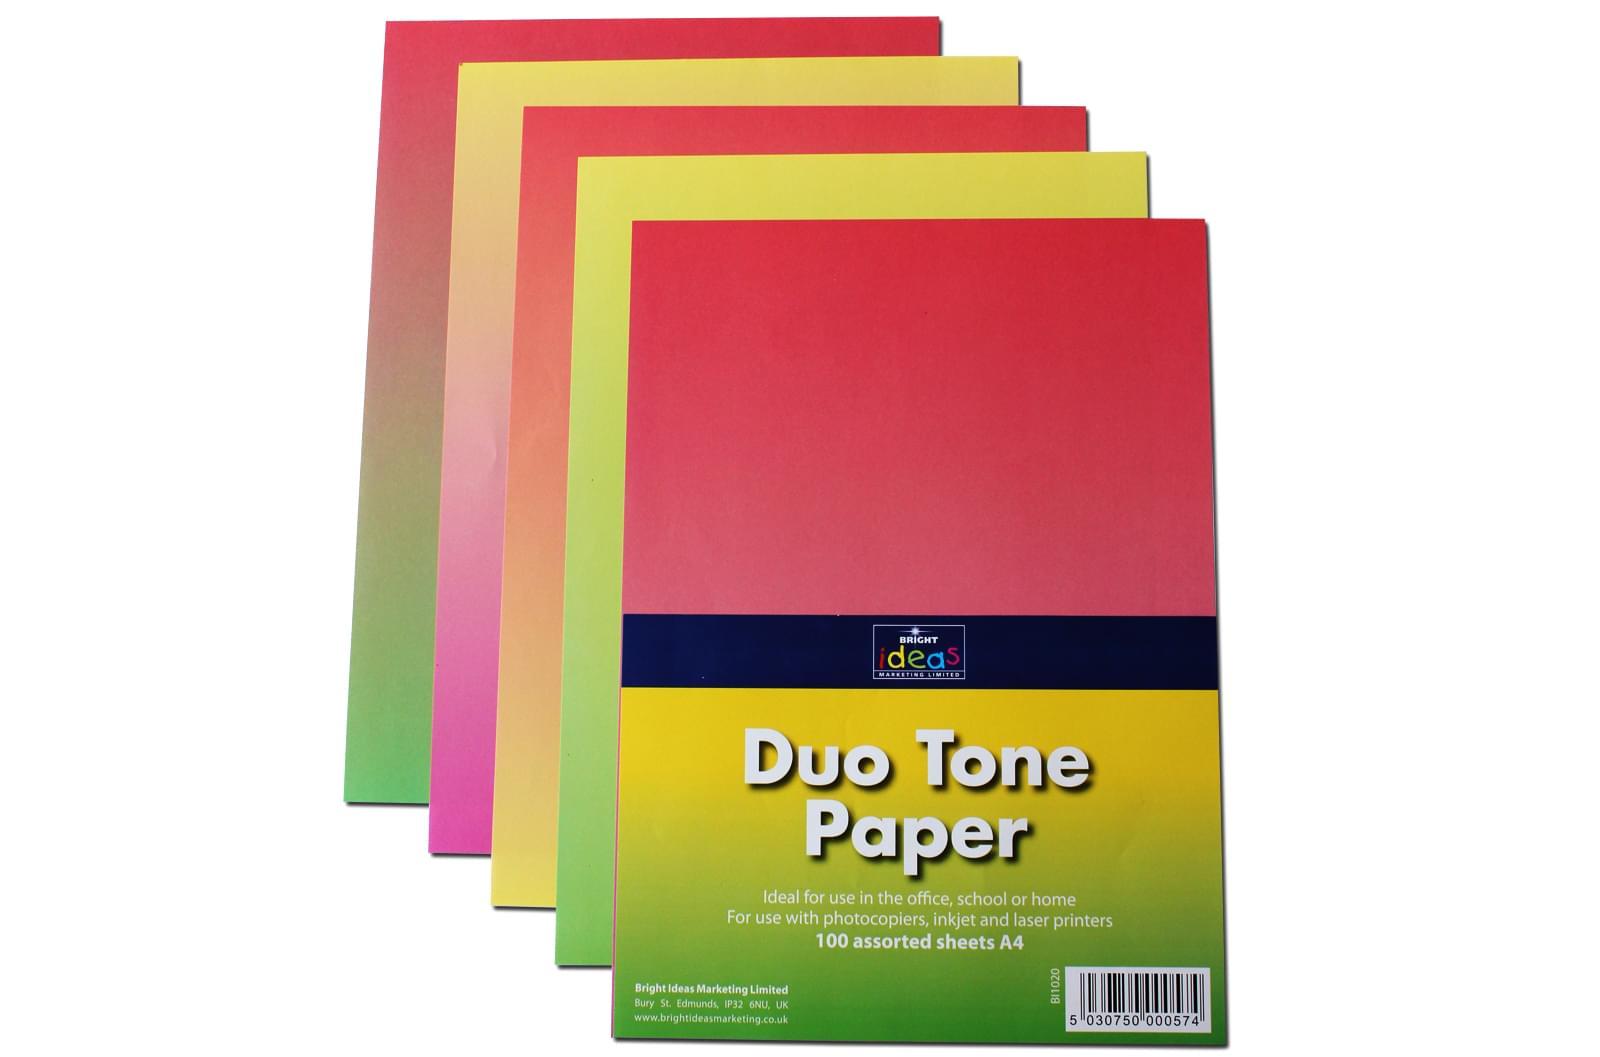 marketing term paper ideas